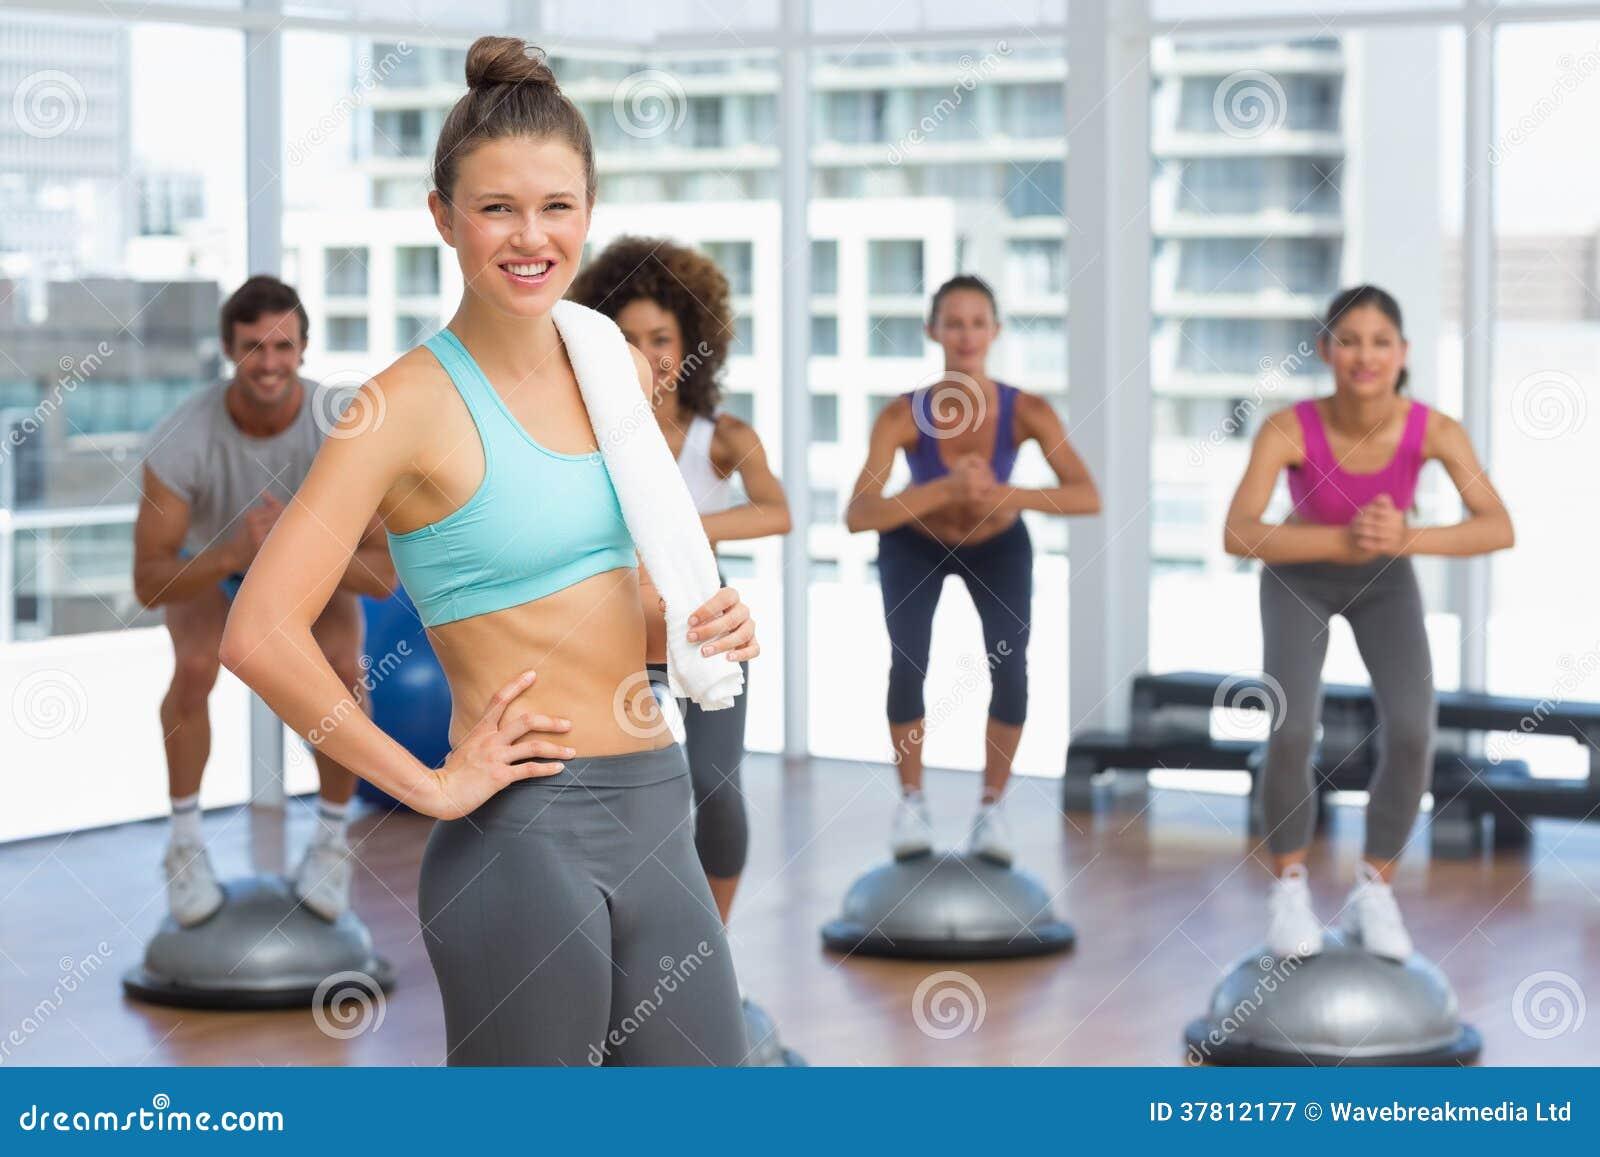 Exercise videos: aerobics exercise videos free download.